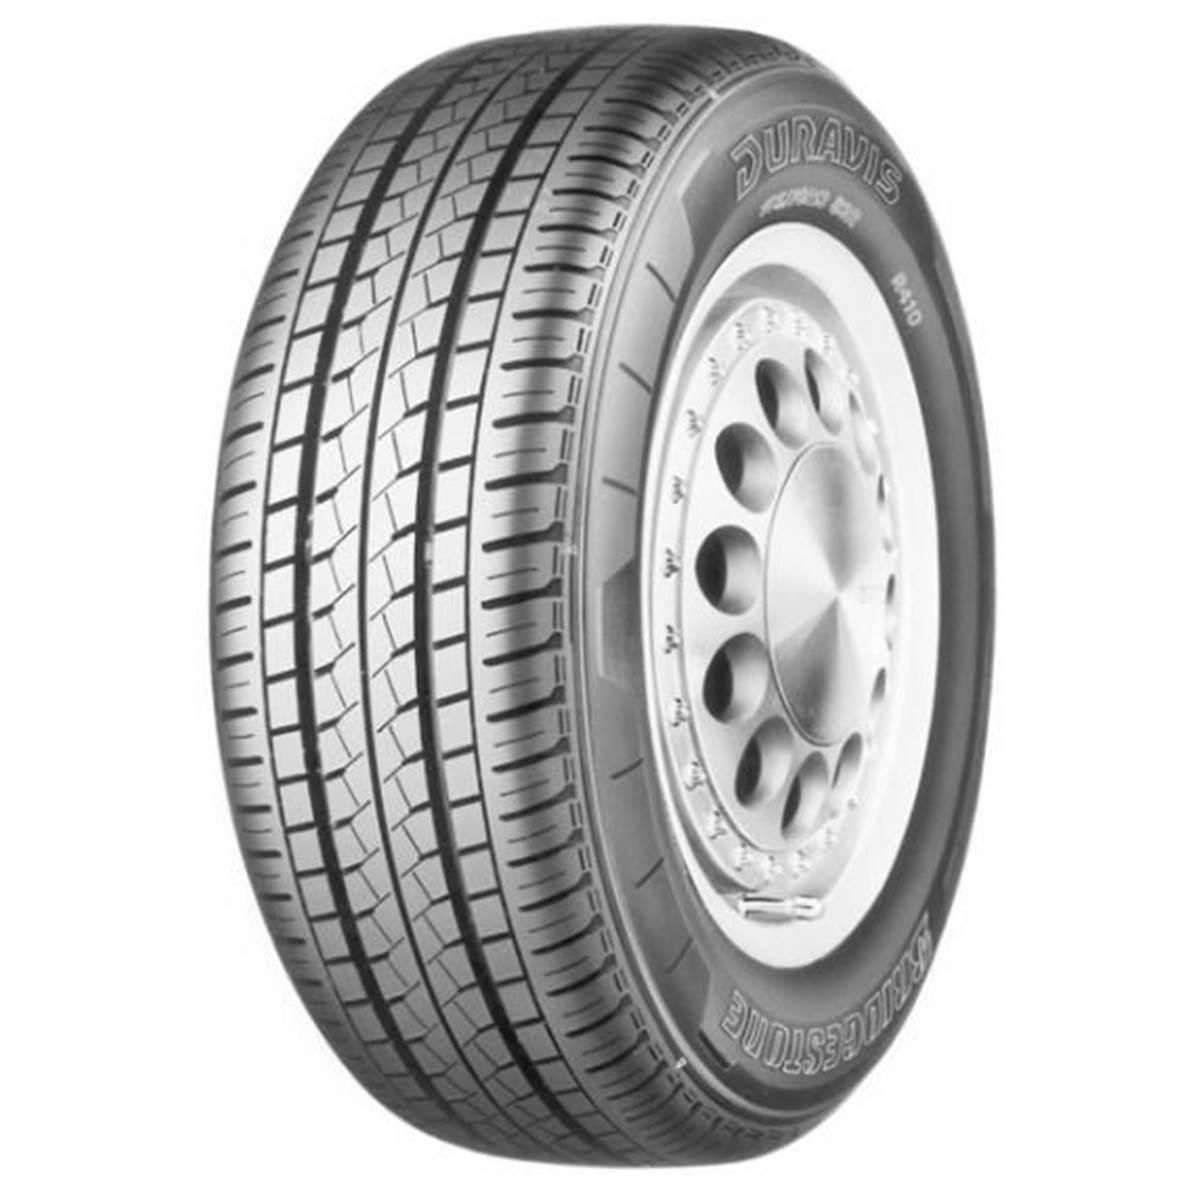 Pneu Bridgestone 215/65R16 102H DURAVIS R410